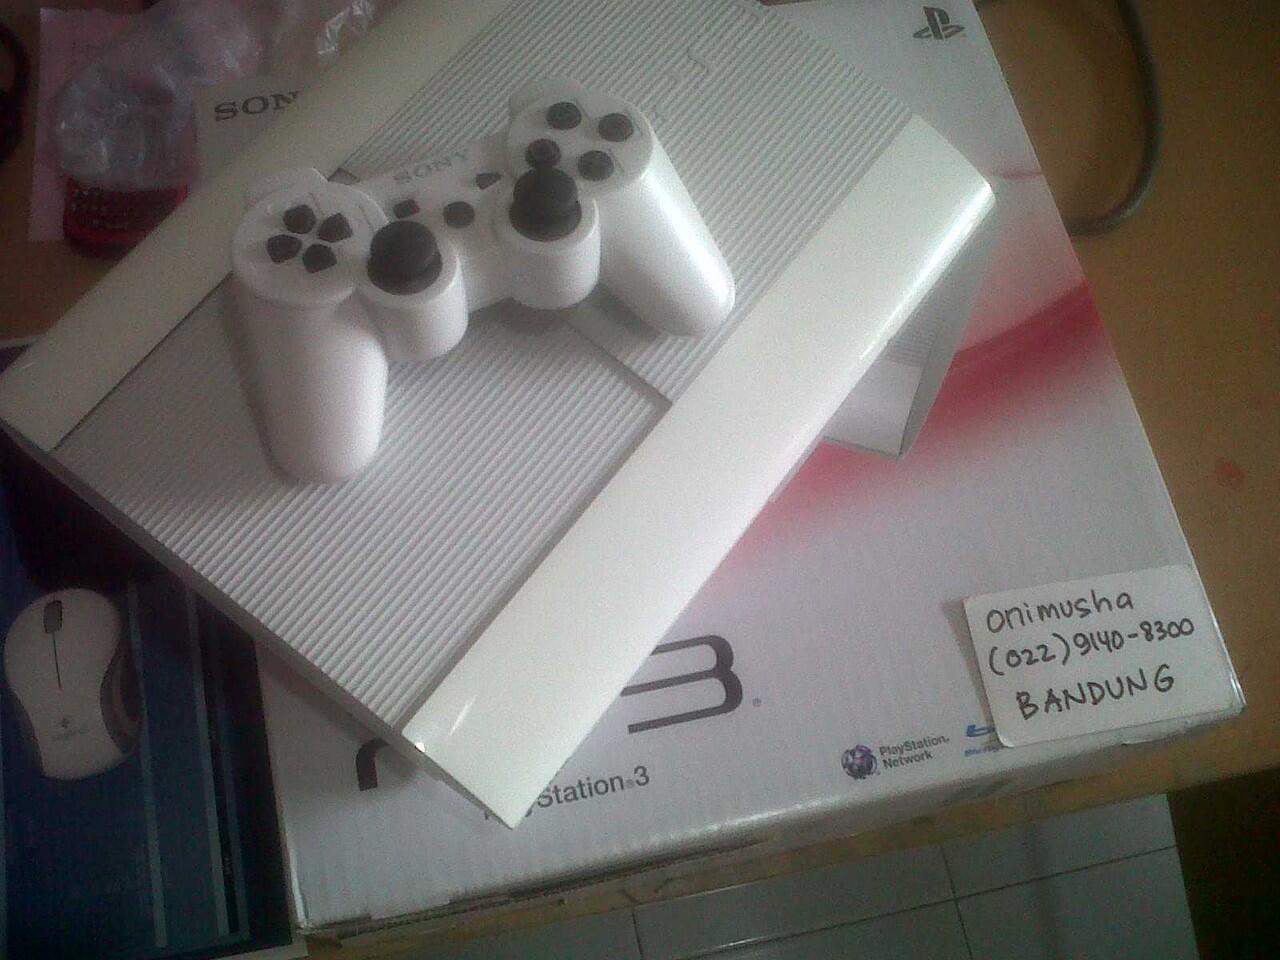 PS3, PSP, PS Vita, XBOX 360 Jasper, SLiM, RGH, LT2 Banyak Pilihan. METRO, BANDUNG.